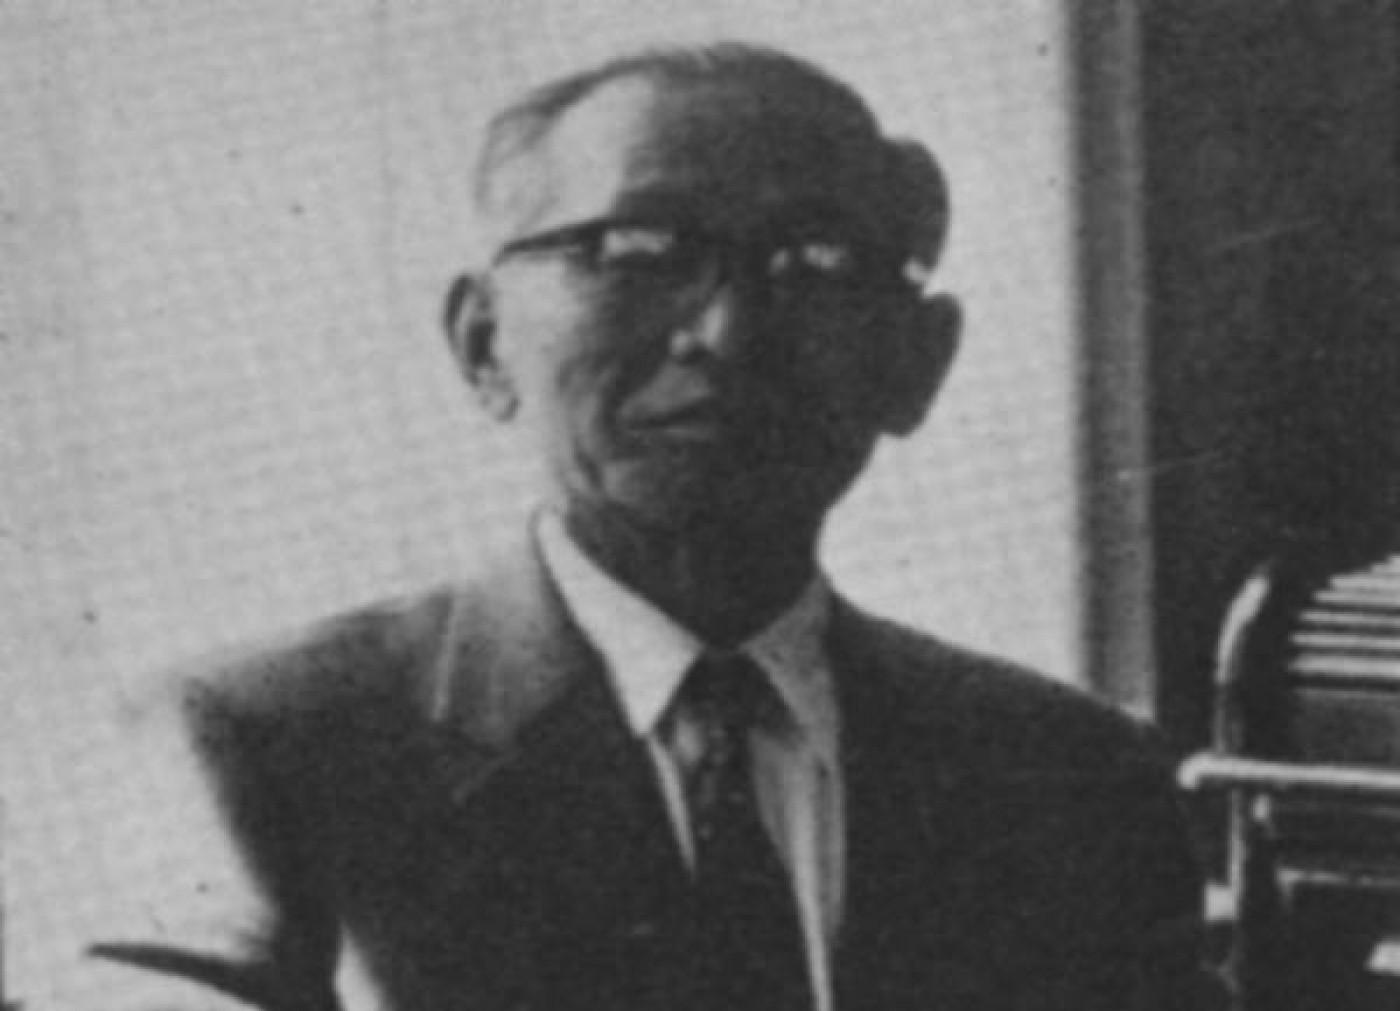 Yasumatsu Hamada